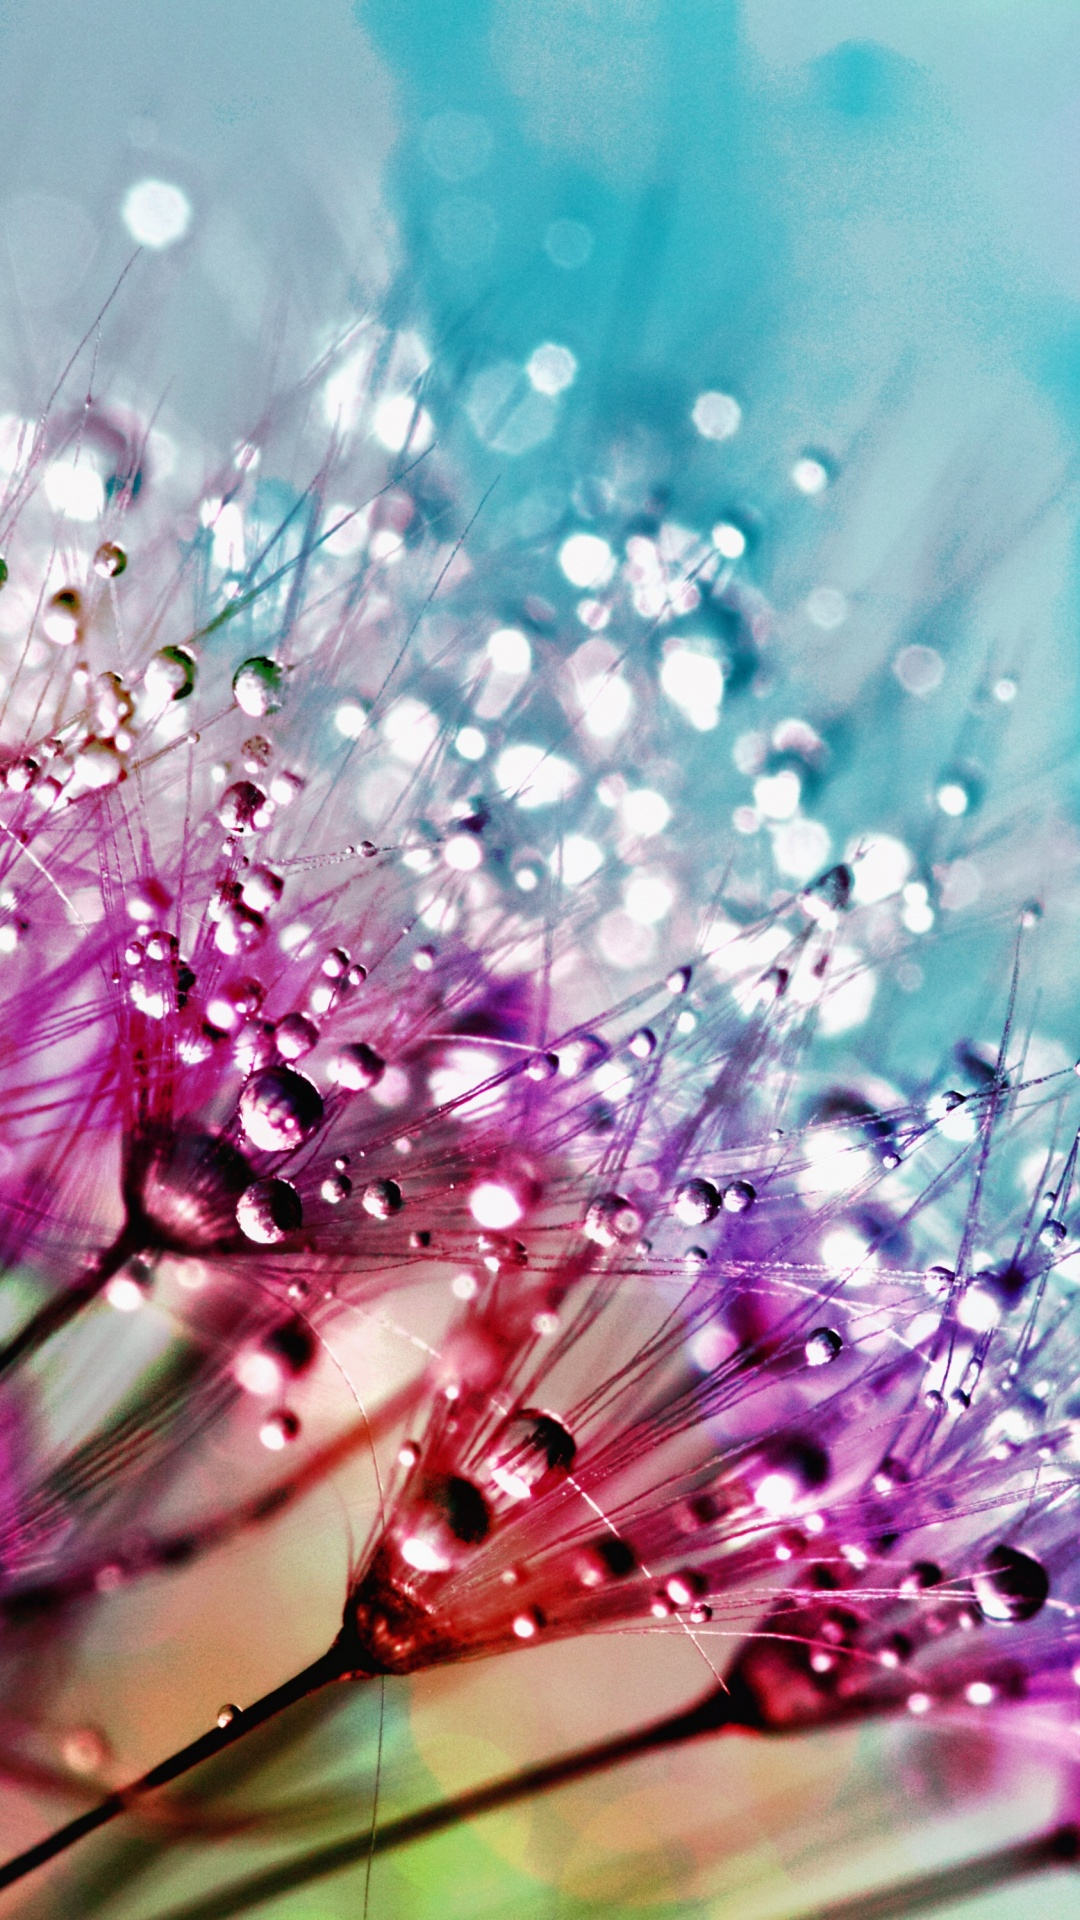 flowers dandelion water colorful faith drops desktop multicolor wallpapers 5k 2070 4k quotes pexels iphone psalms bible hope psalm 4kwallpapers